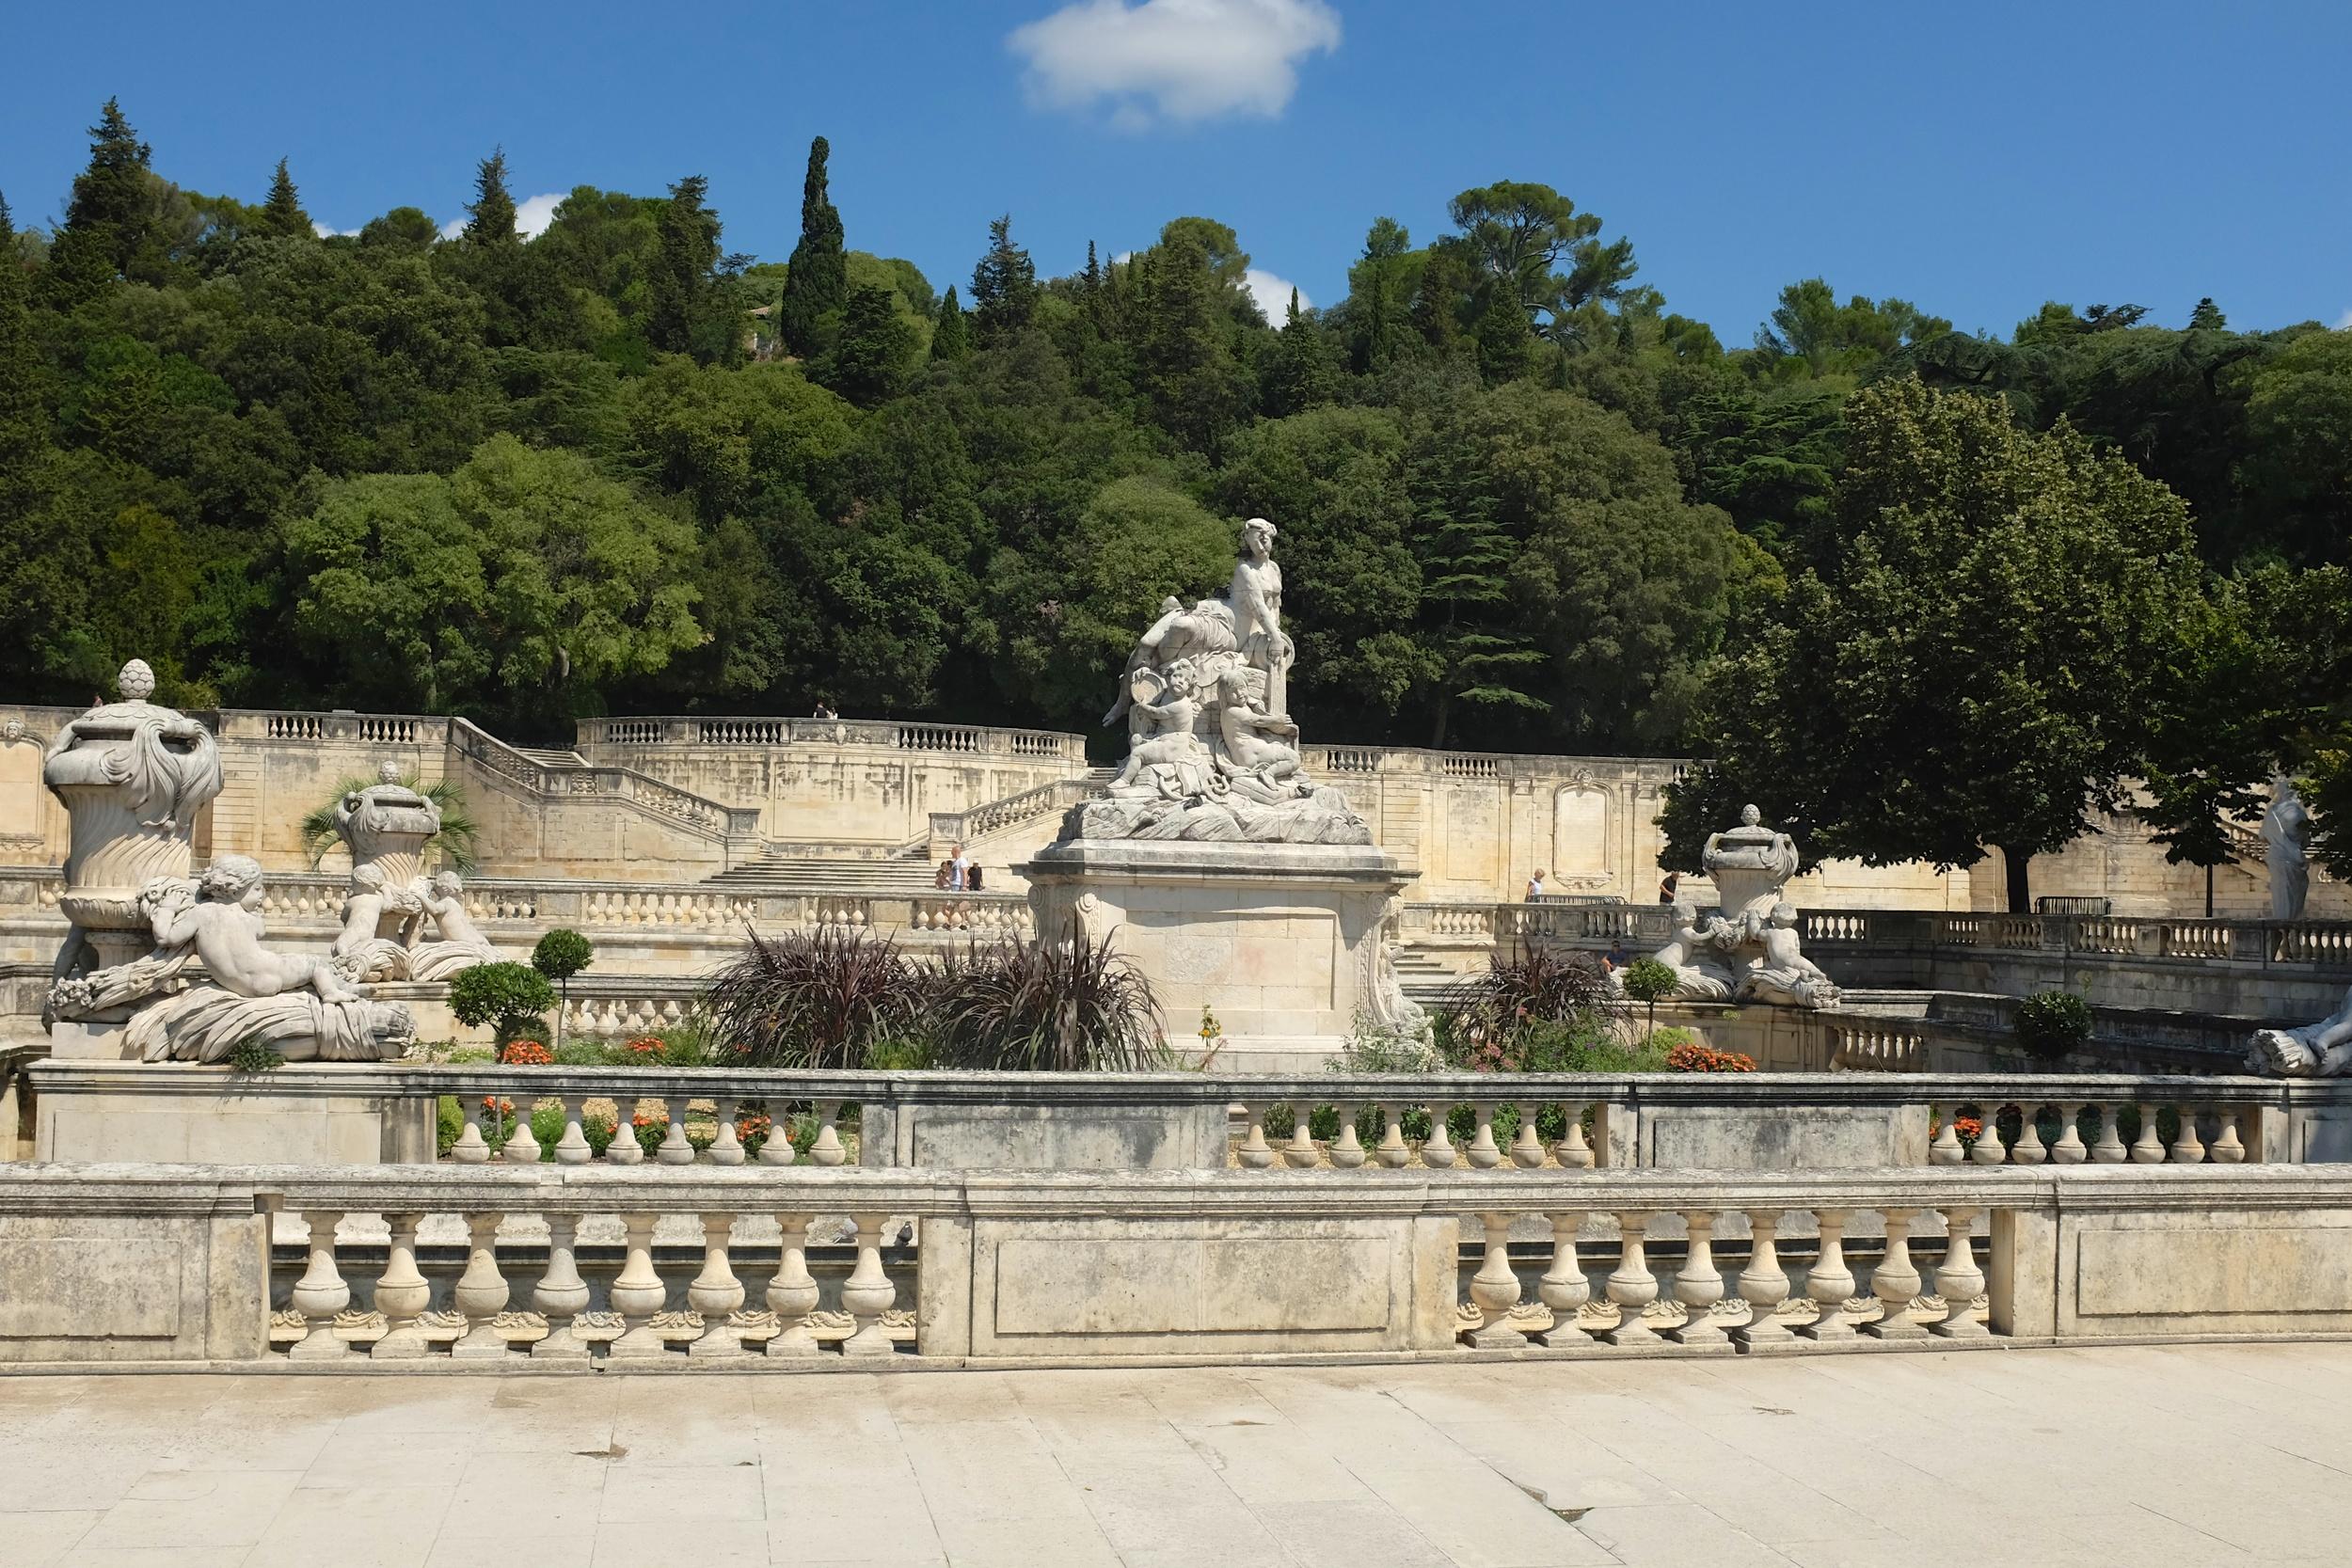 The centerpiece sculptures at the gardens